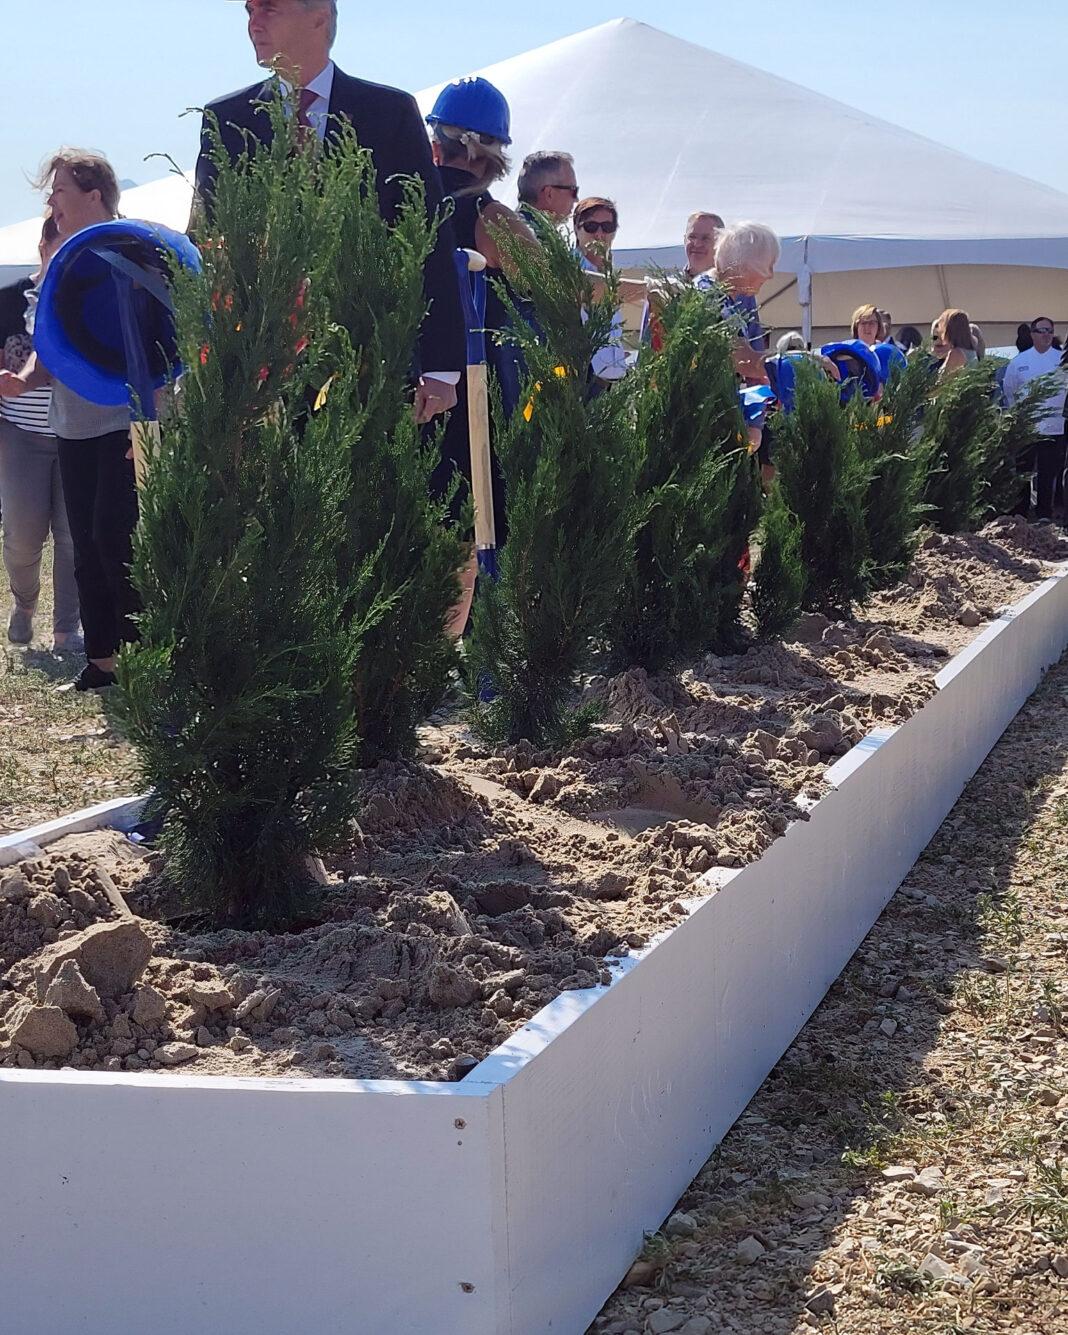 Row of planted juniper trees